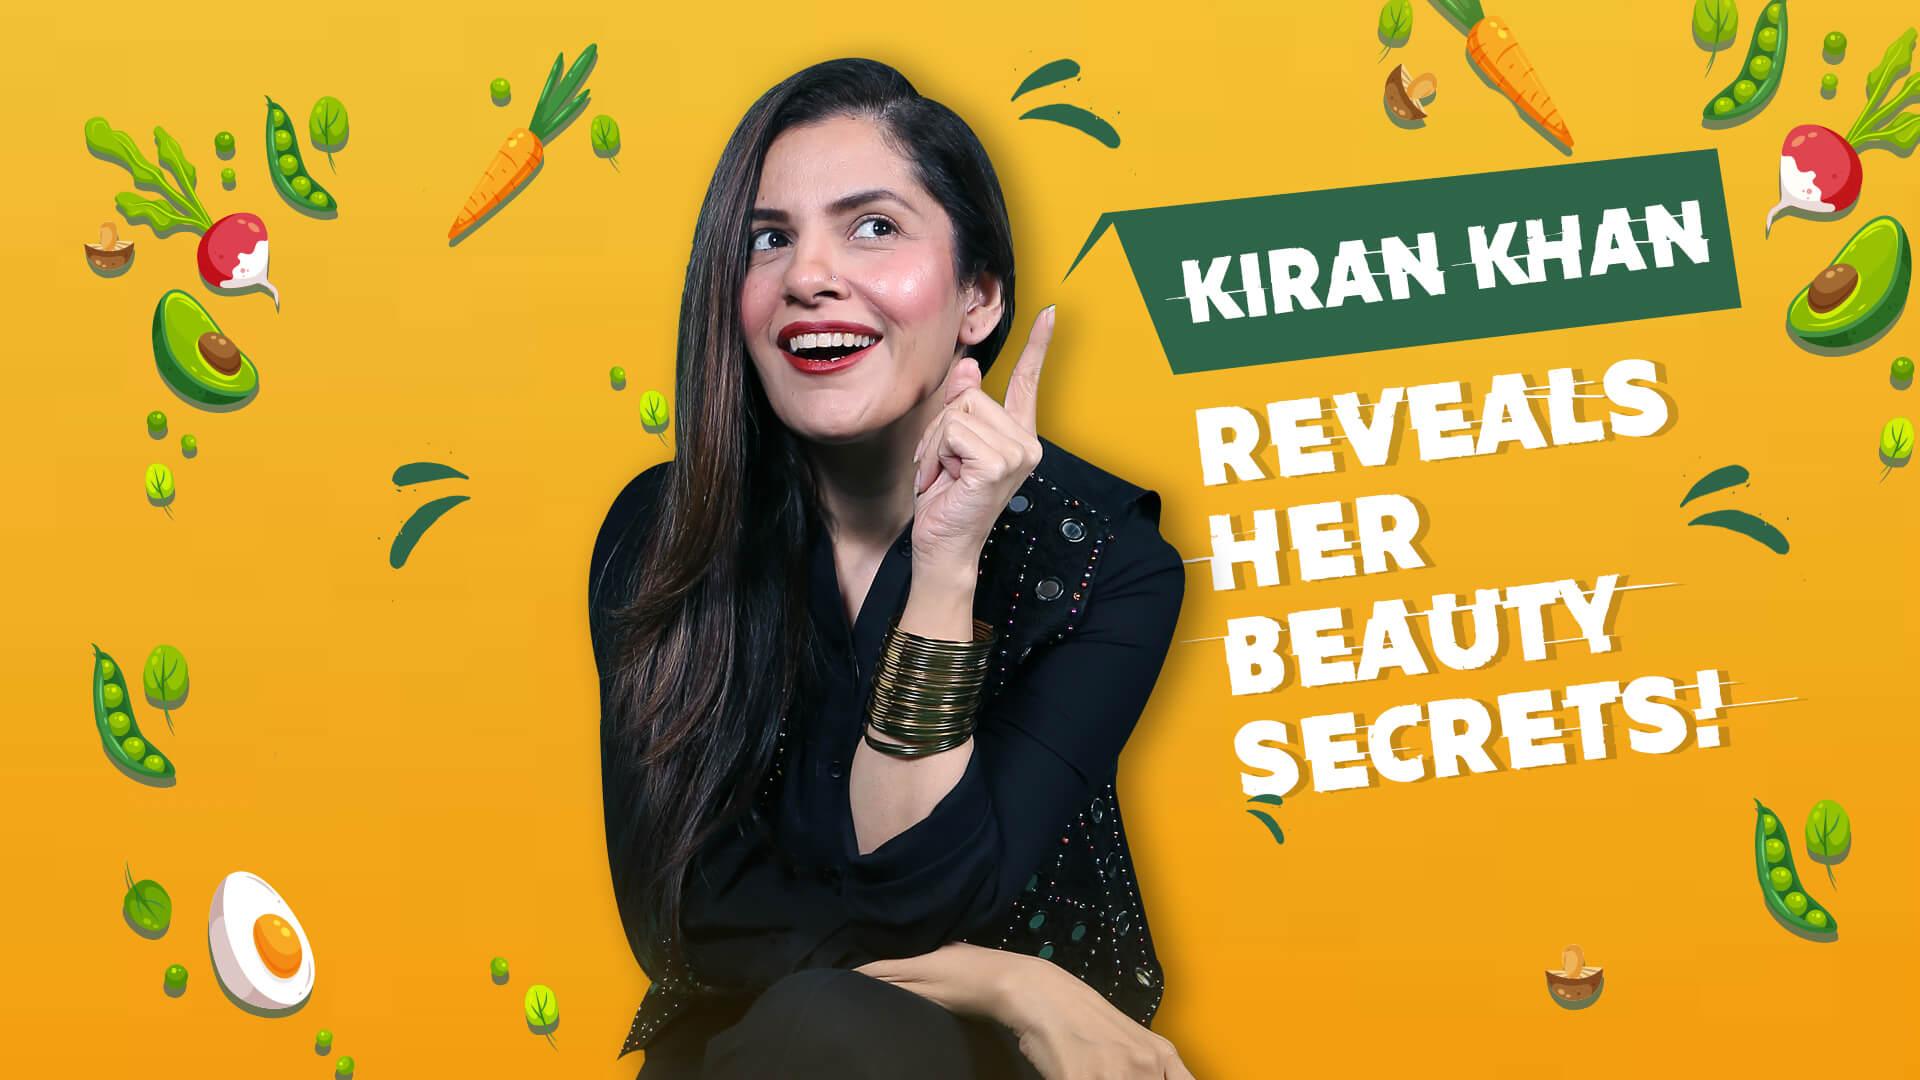 Kiran Khan reveals her beauty secrets